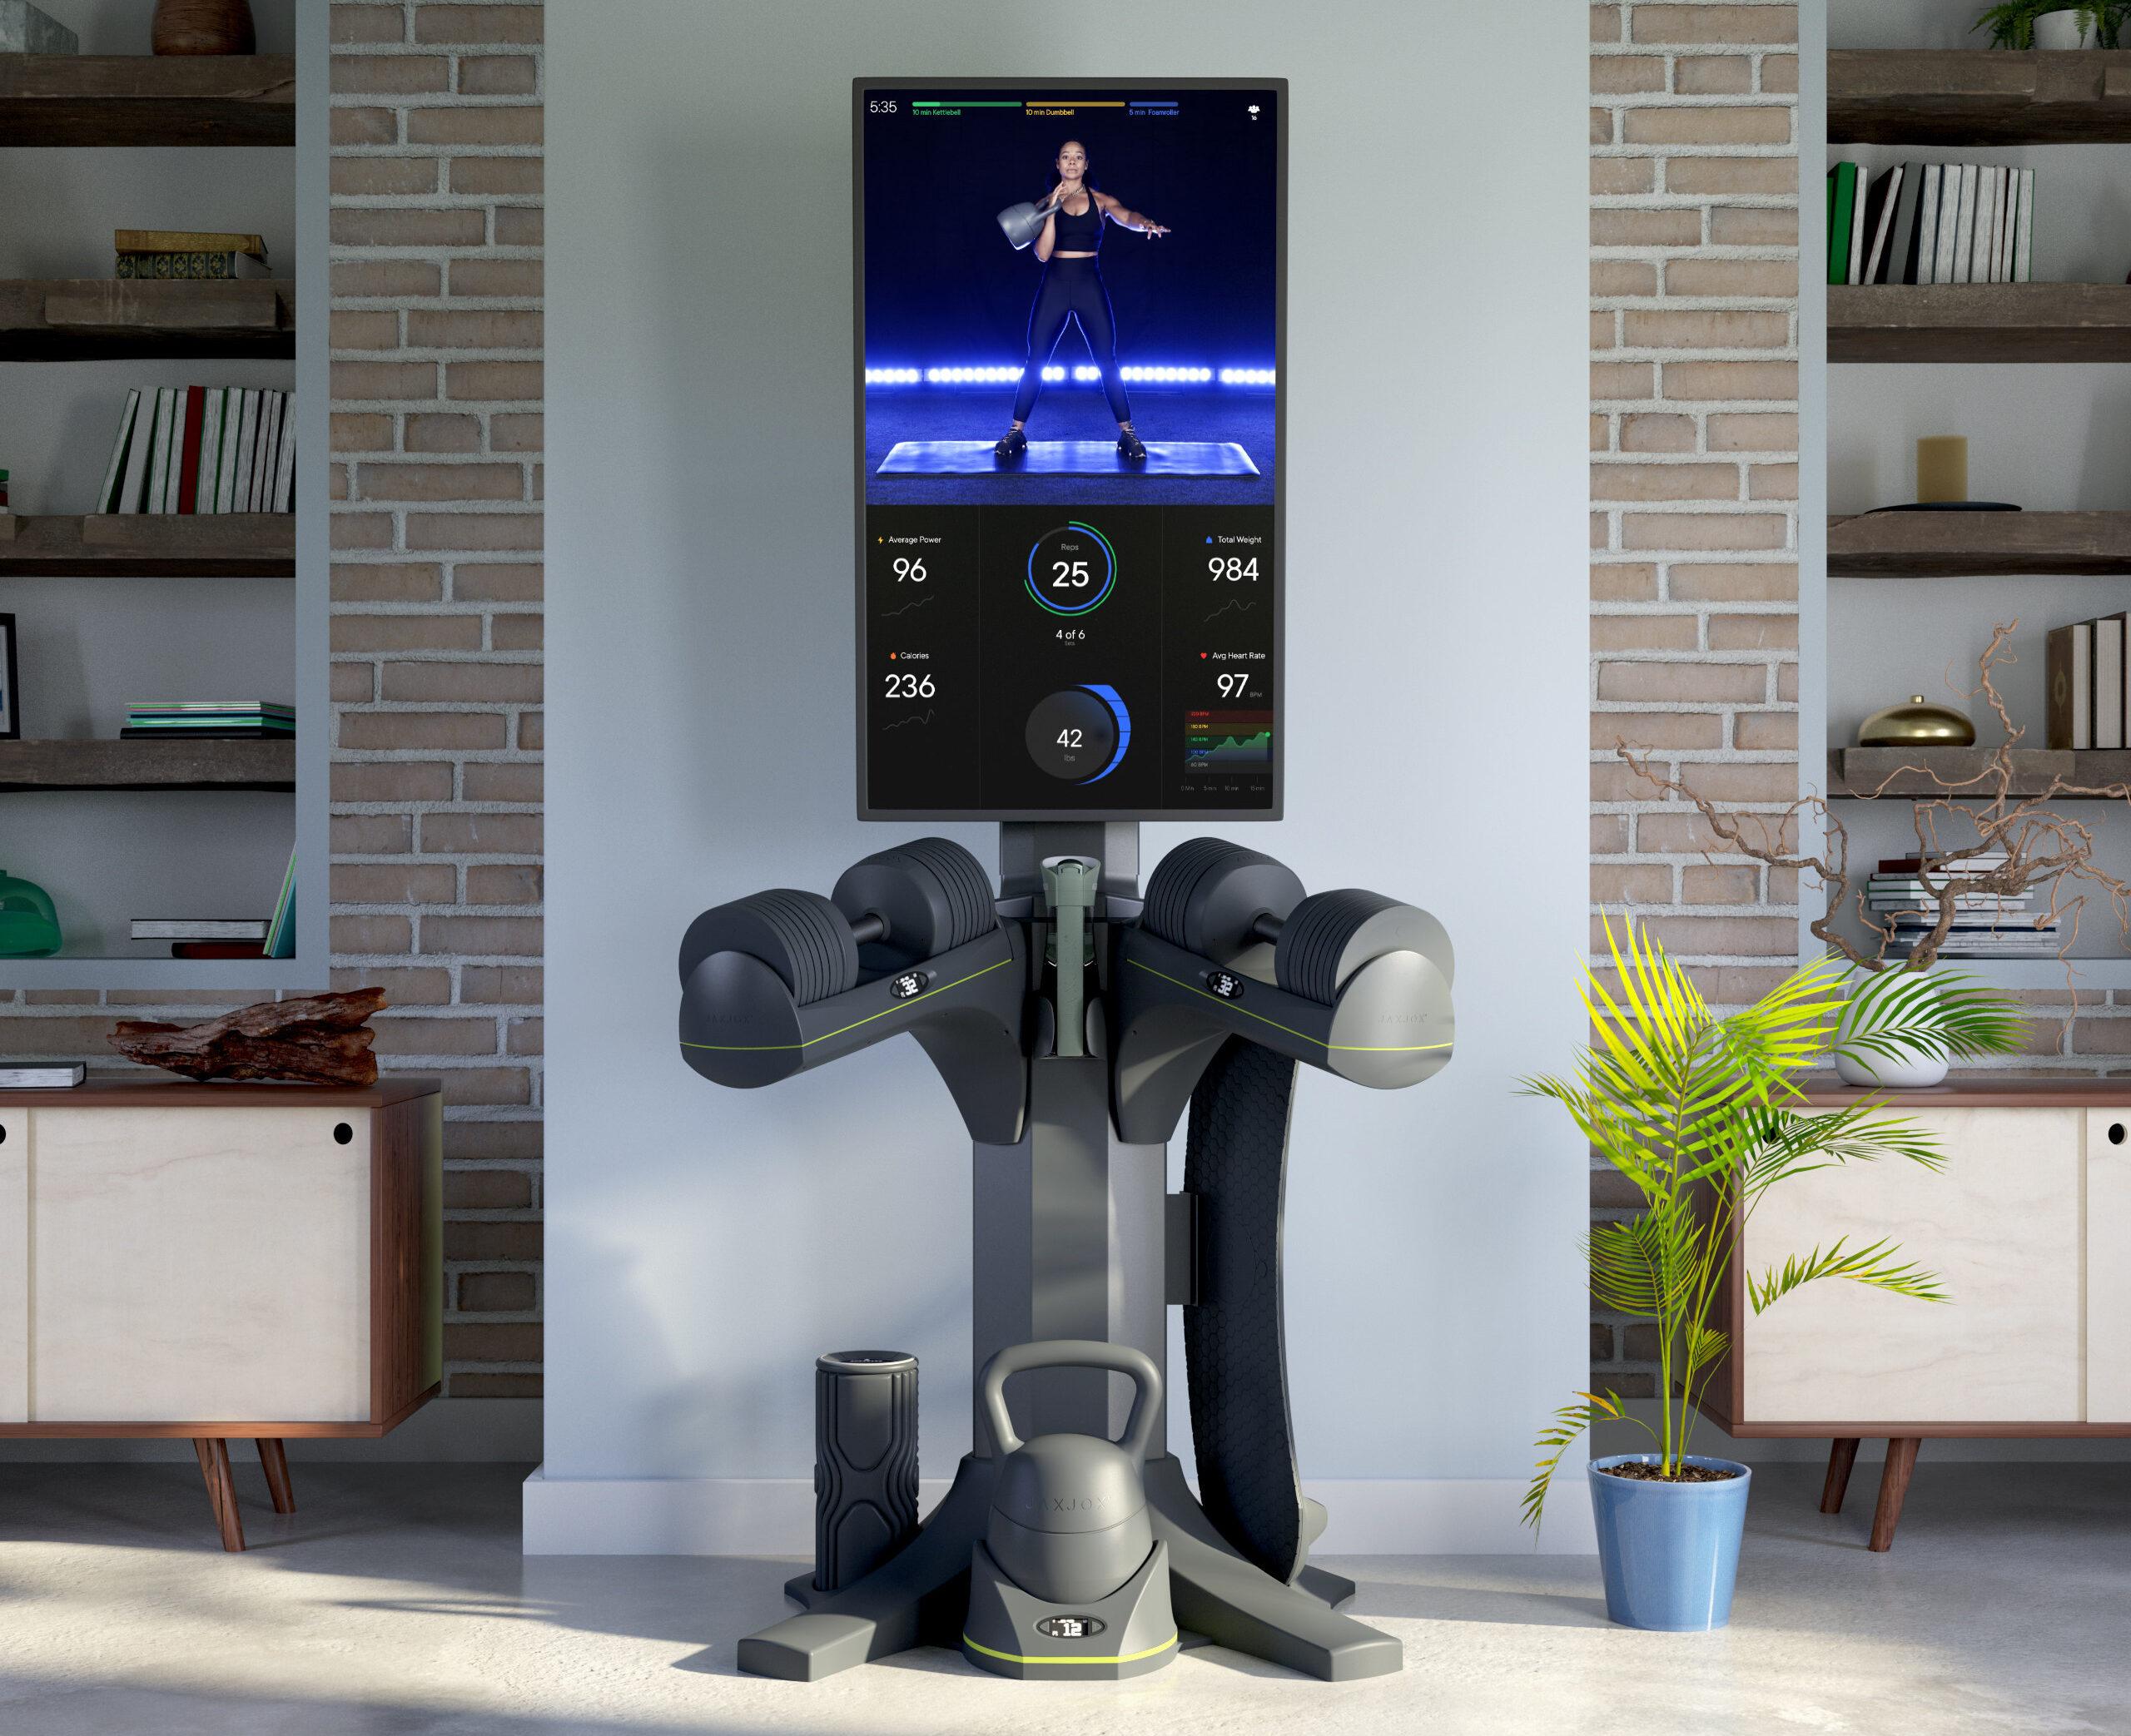 Smart gym gear startup JaxJox scoops £7.7m funding